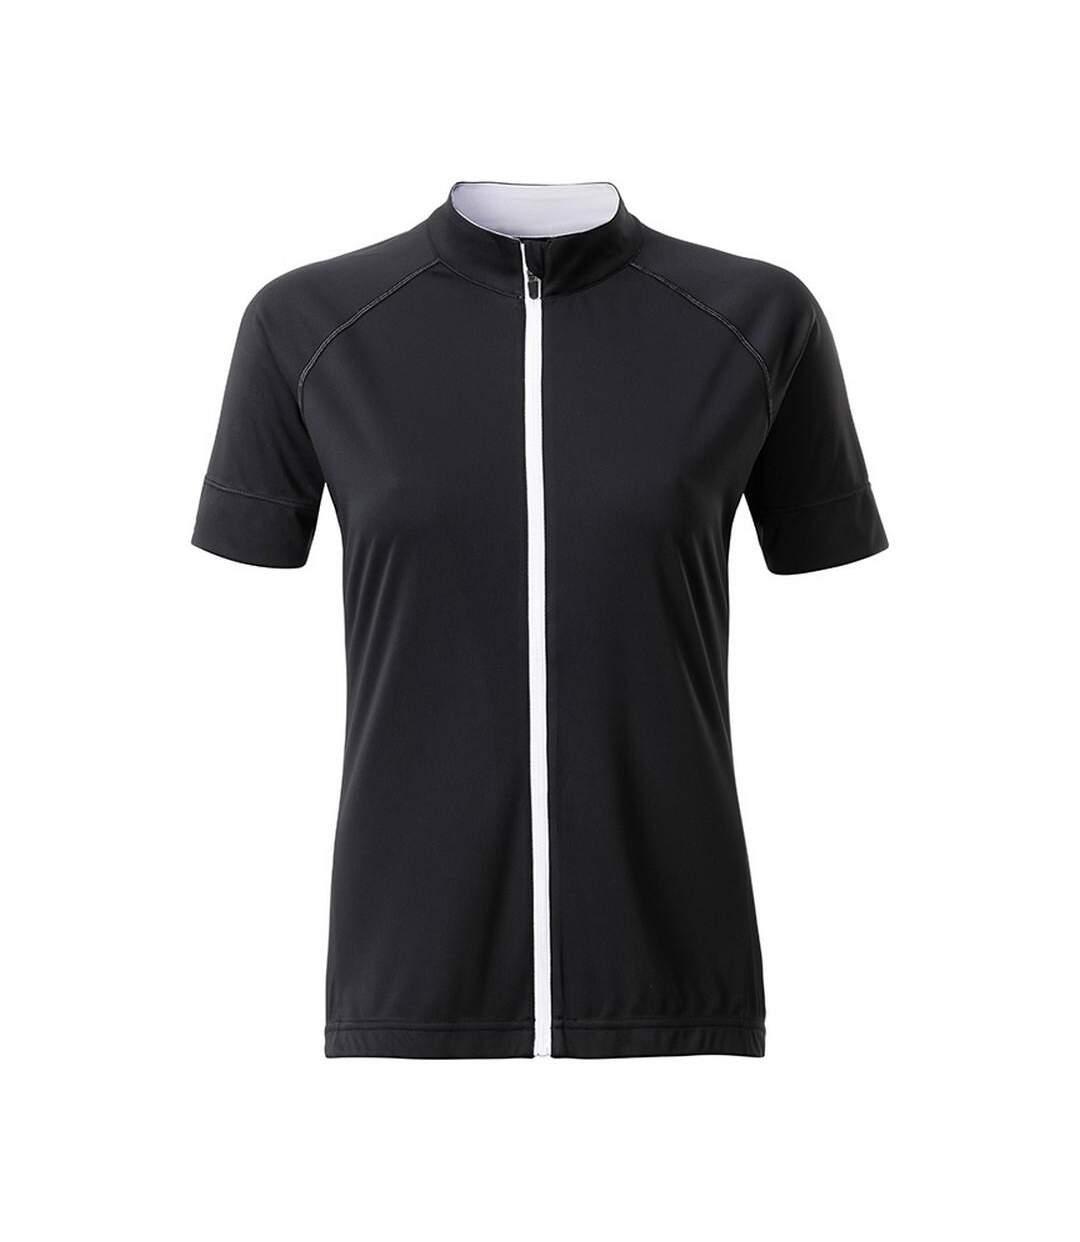 James And Nicholson - T-Shirt Zippé - Femme (Noir / blanc) - UTFU166